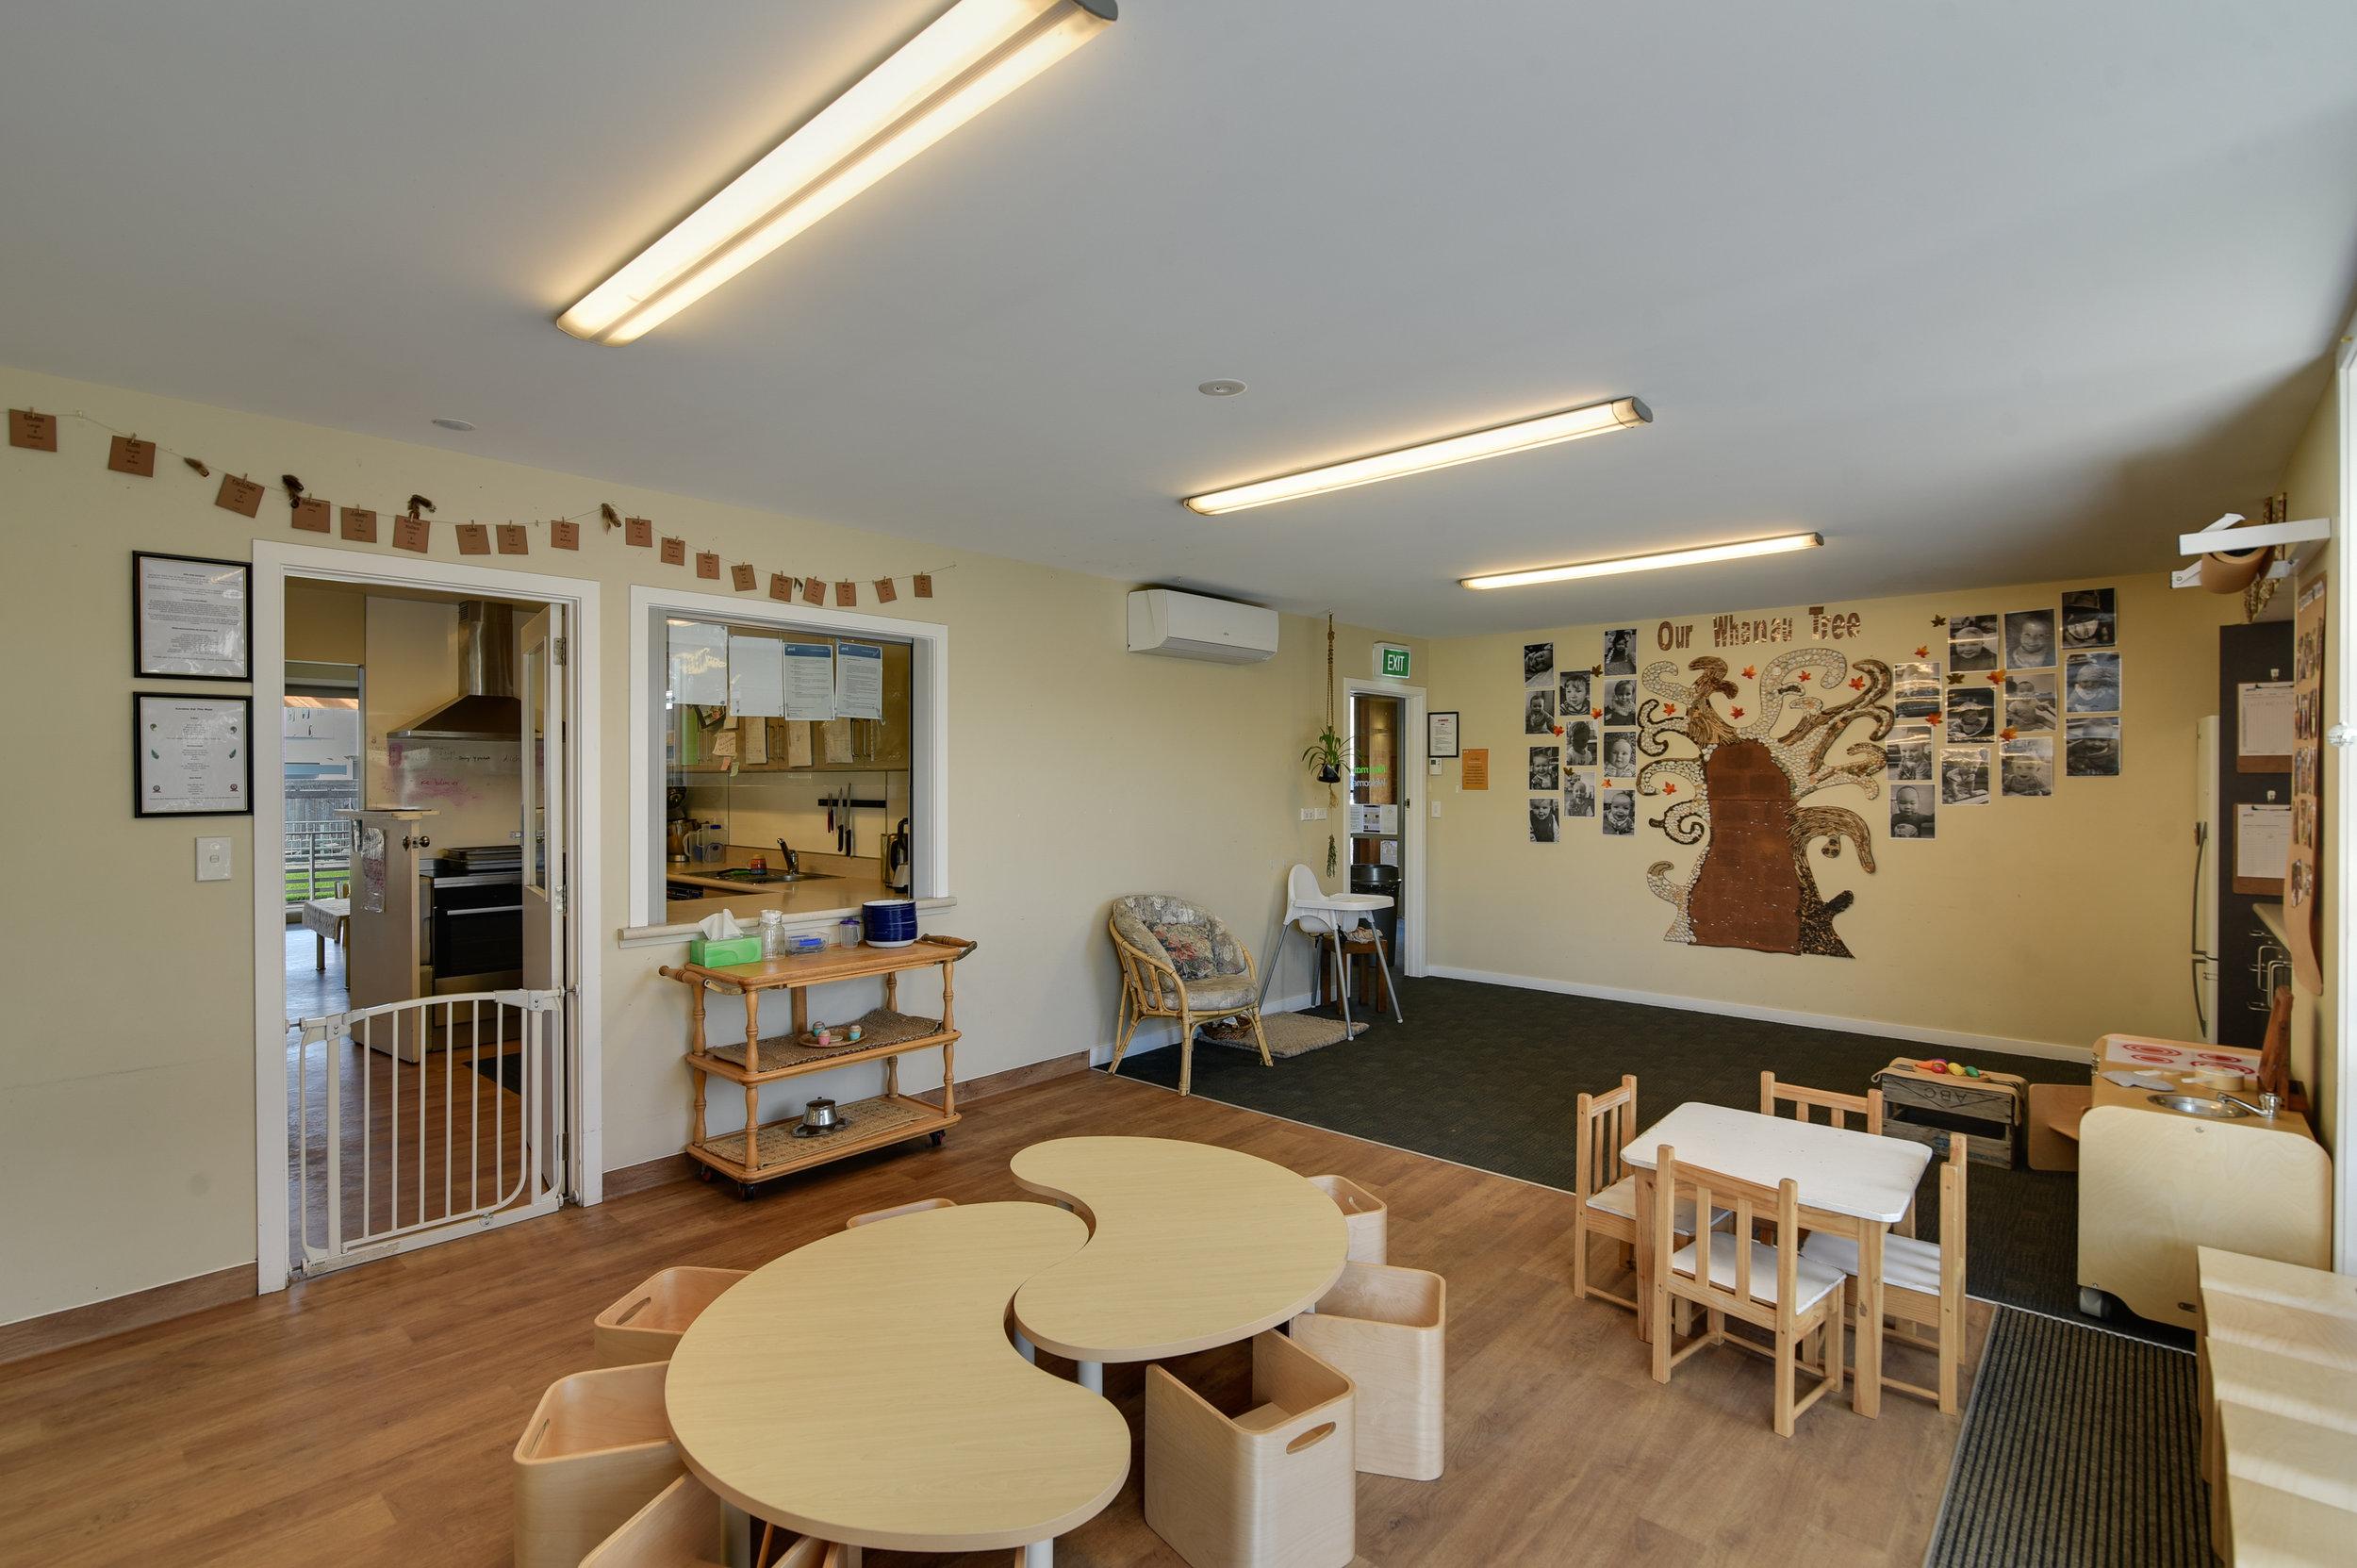 Gems Childcare interiors-11.jpg